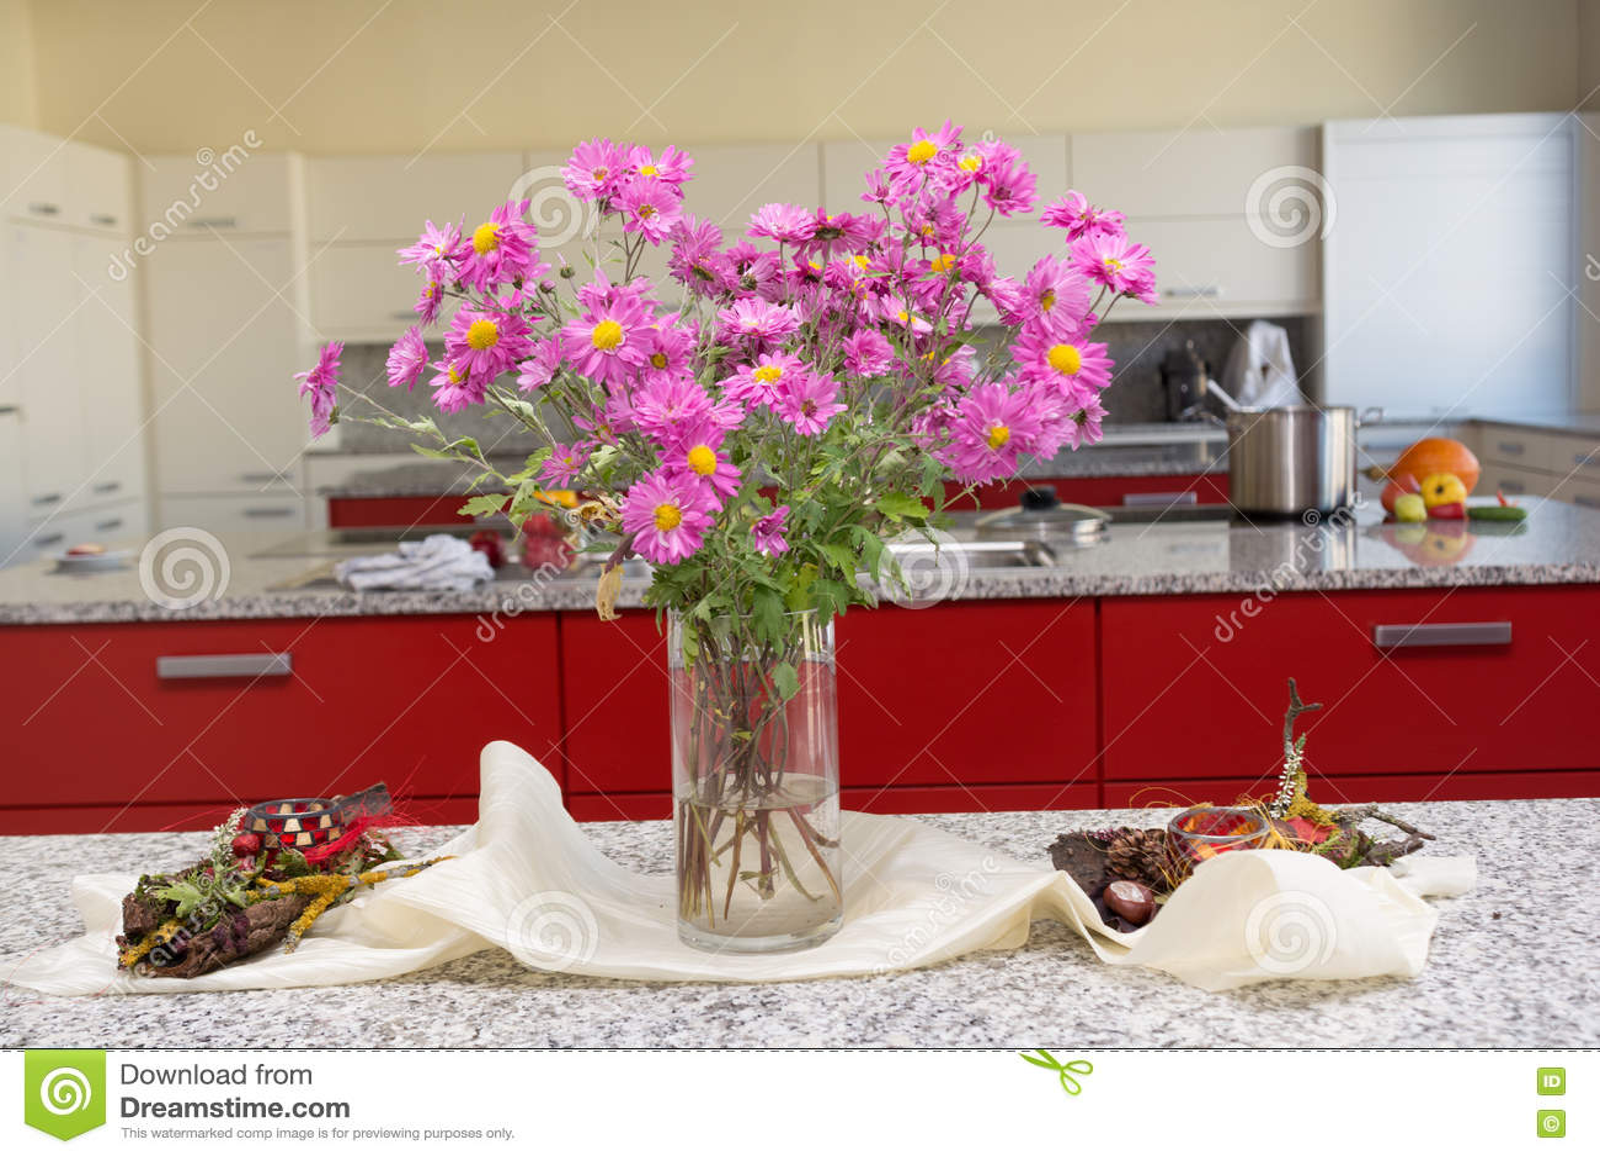 fall kitchen decor vent duct 秋季花束在厨房里库存照片 图片包括有michaelmas 开花的 绽放 秋天 与michaelmas雏菊的强的光亮桌装饰在厨房里